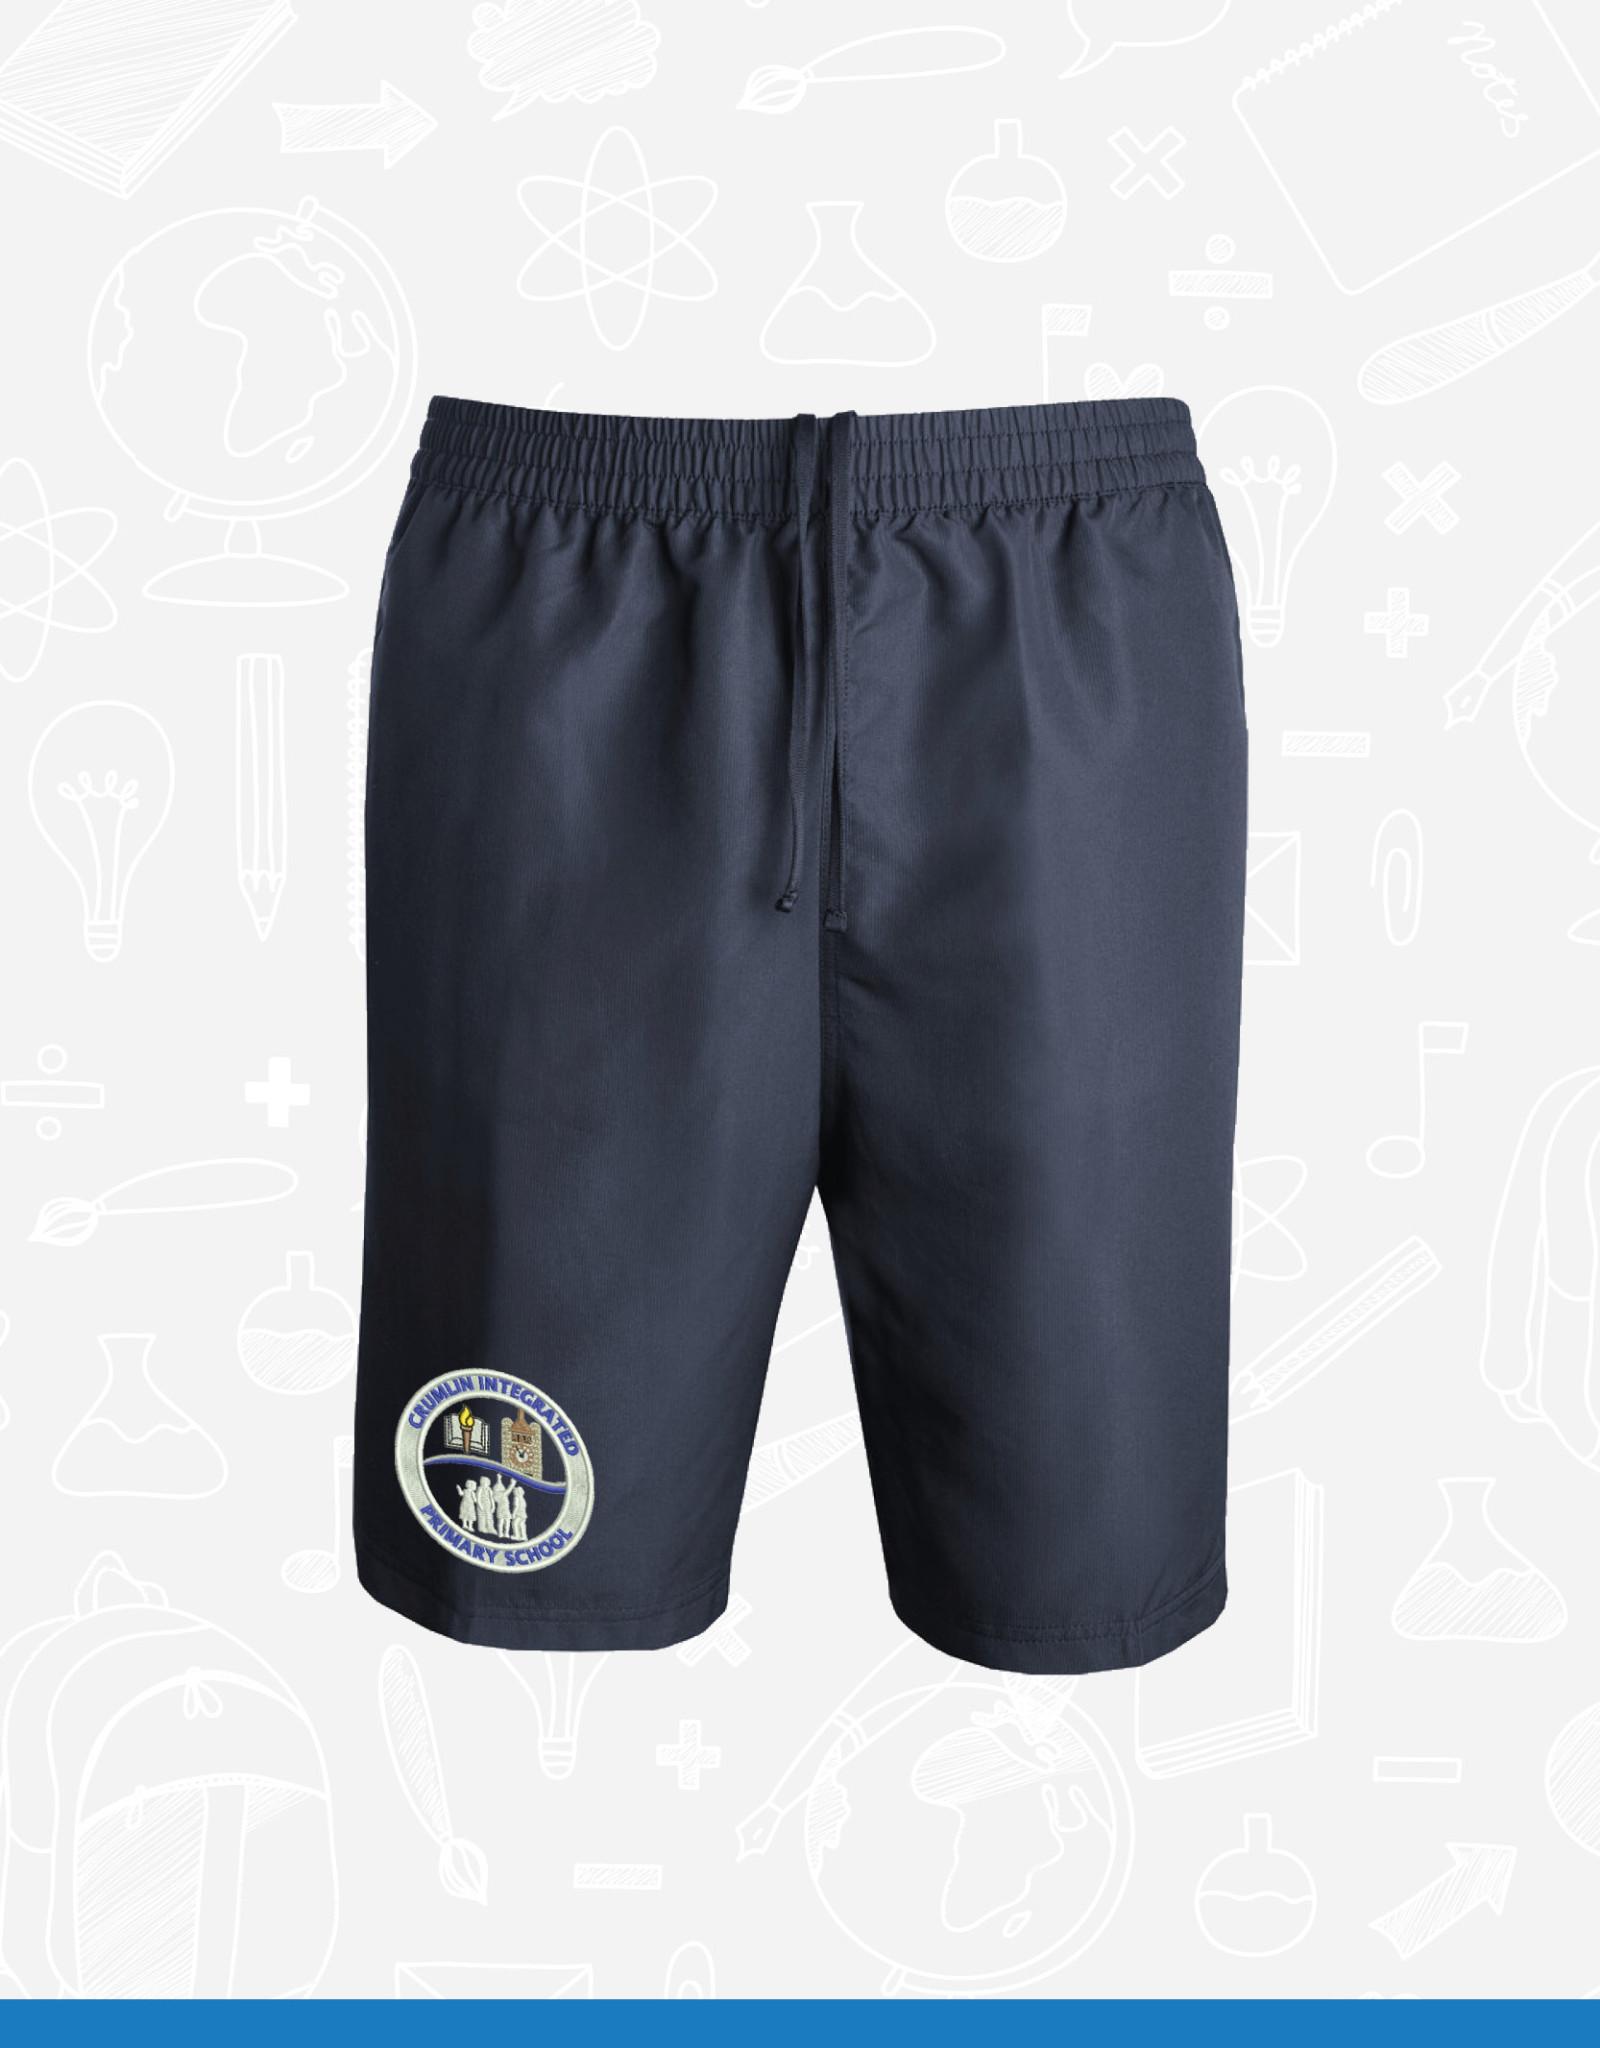 Aptus Crumlin Integrated PE Shorts (111886)